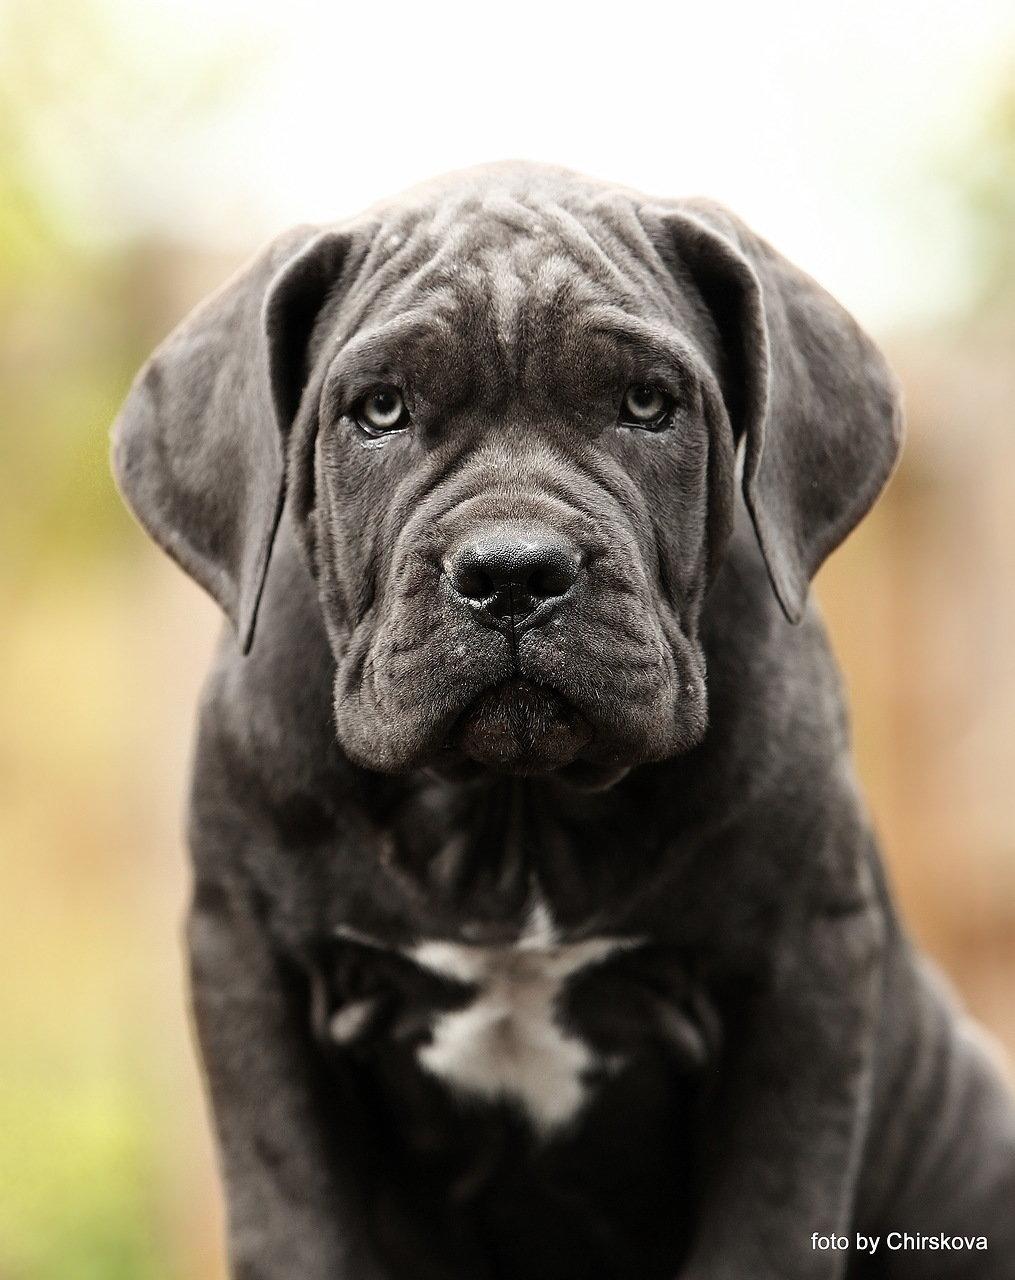 лого, фото собак кане корсо серого цвета эти жидкости